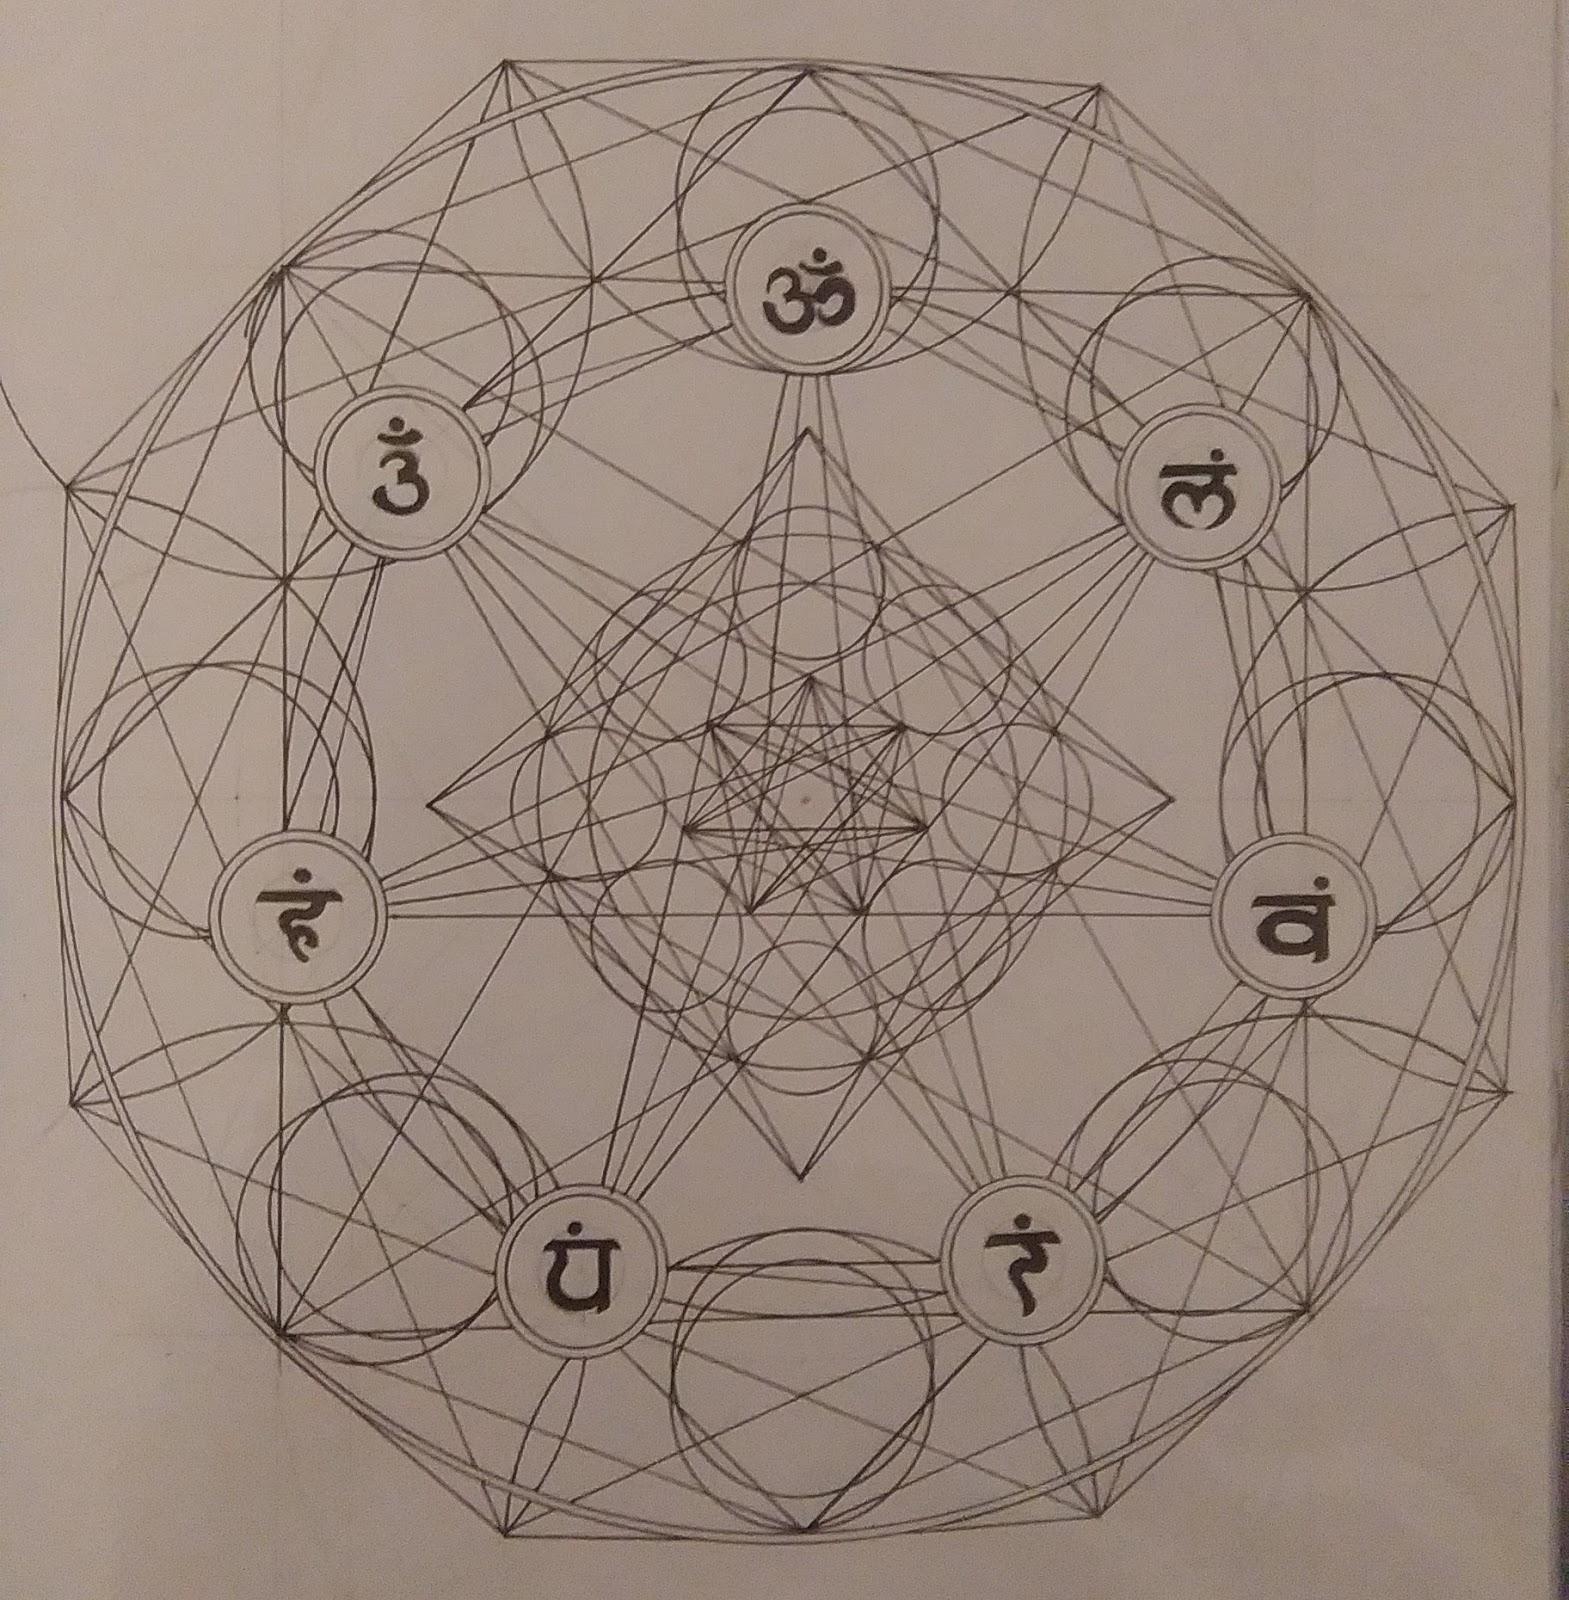 [SPOLYK] - Geometries & sketches - Page 6 48275237_1103195483200468_7880340505039470592_o